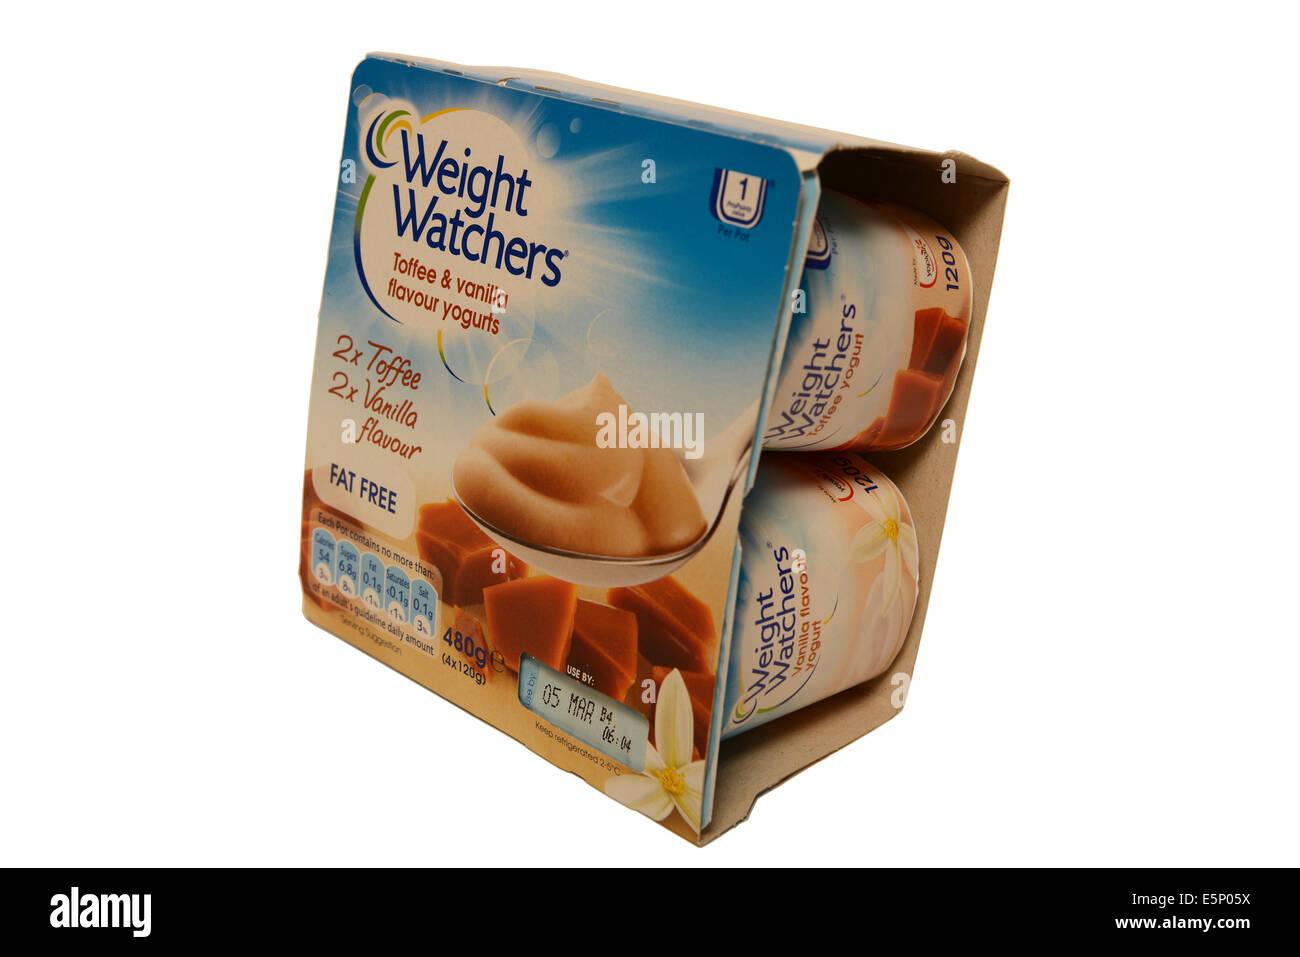 Weight Watchers Yogurts - Stock Image